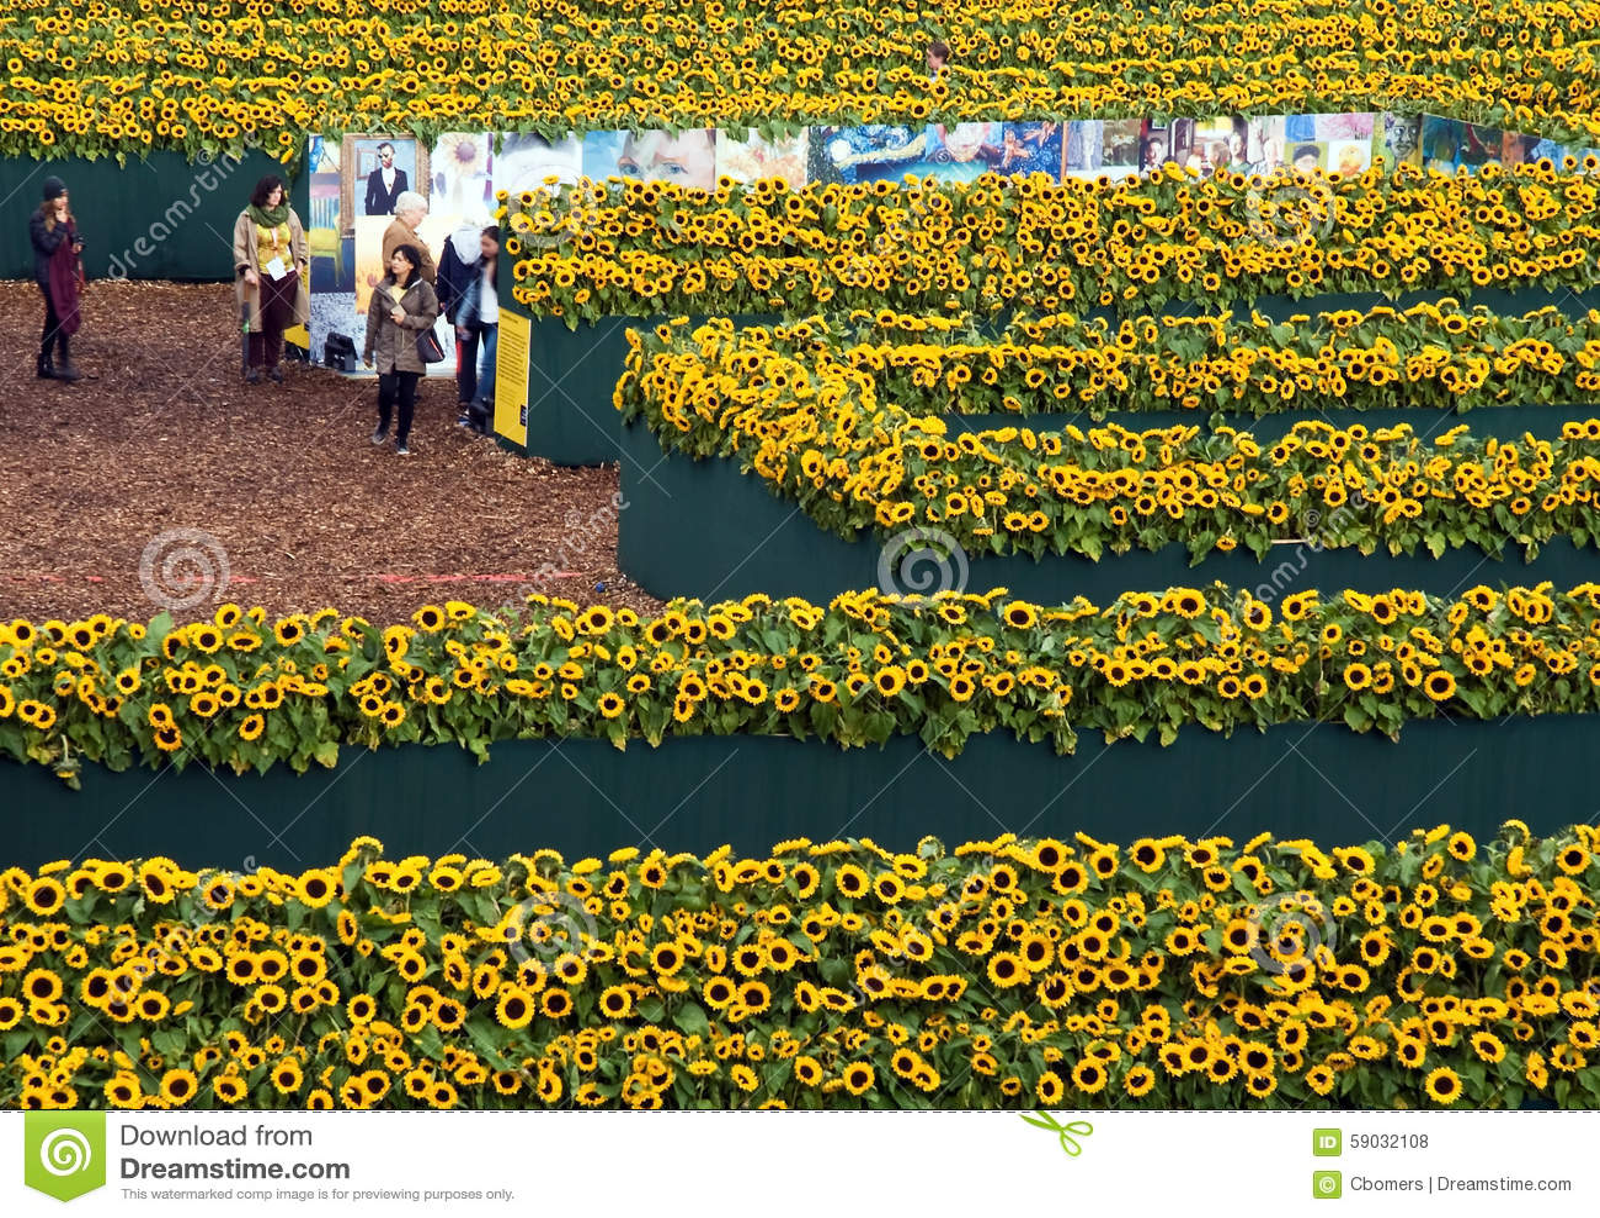 Sunflower Labyrint 2015 Van Gogh Museum